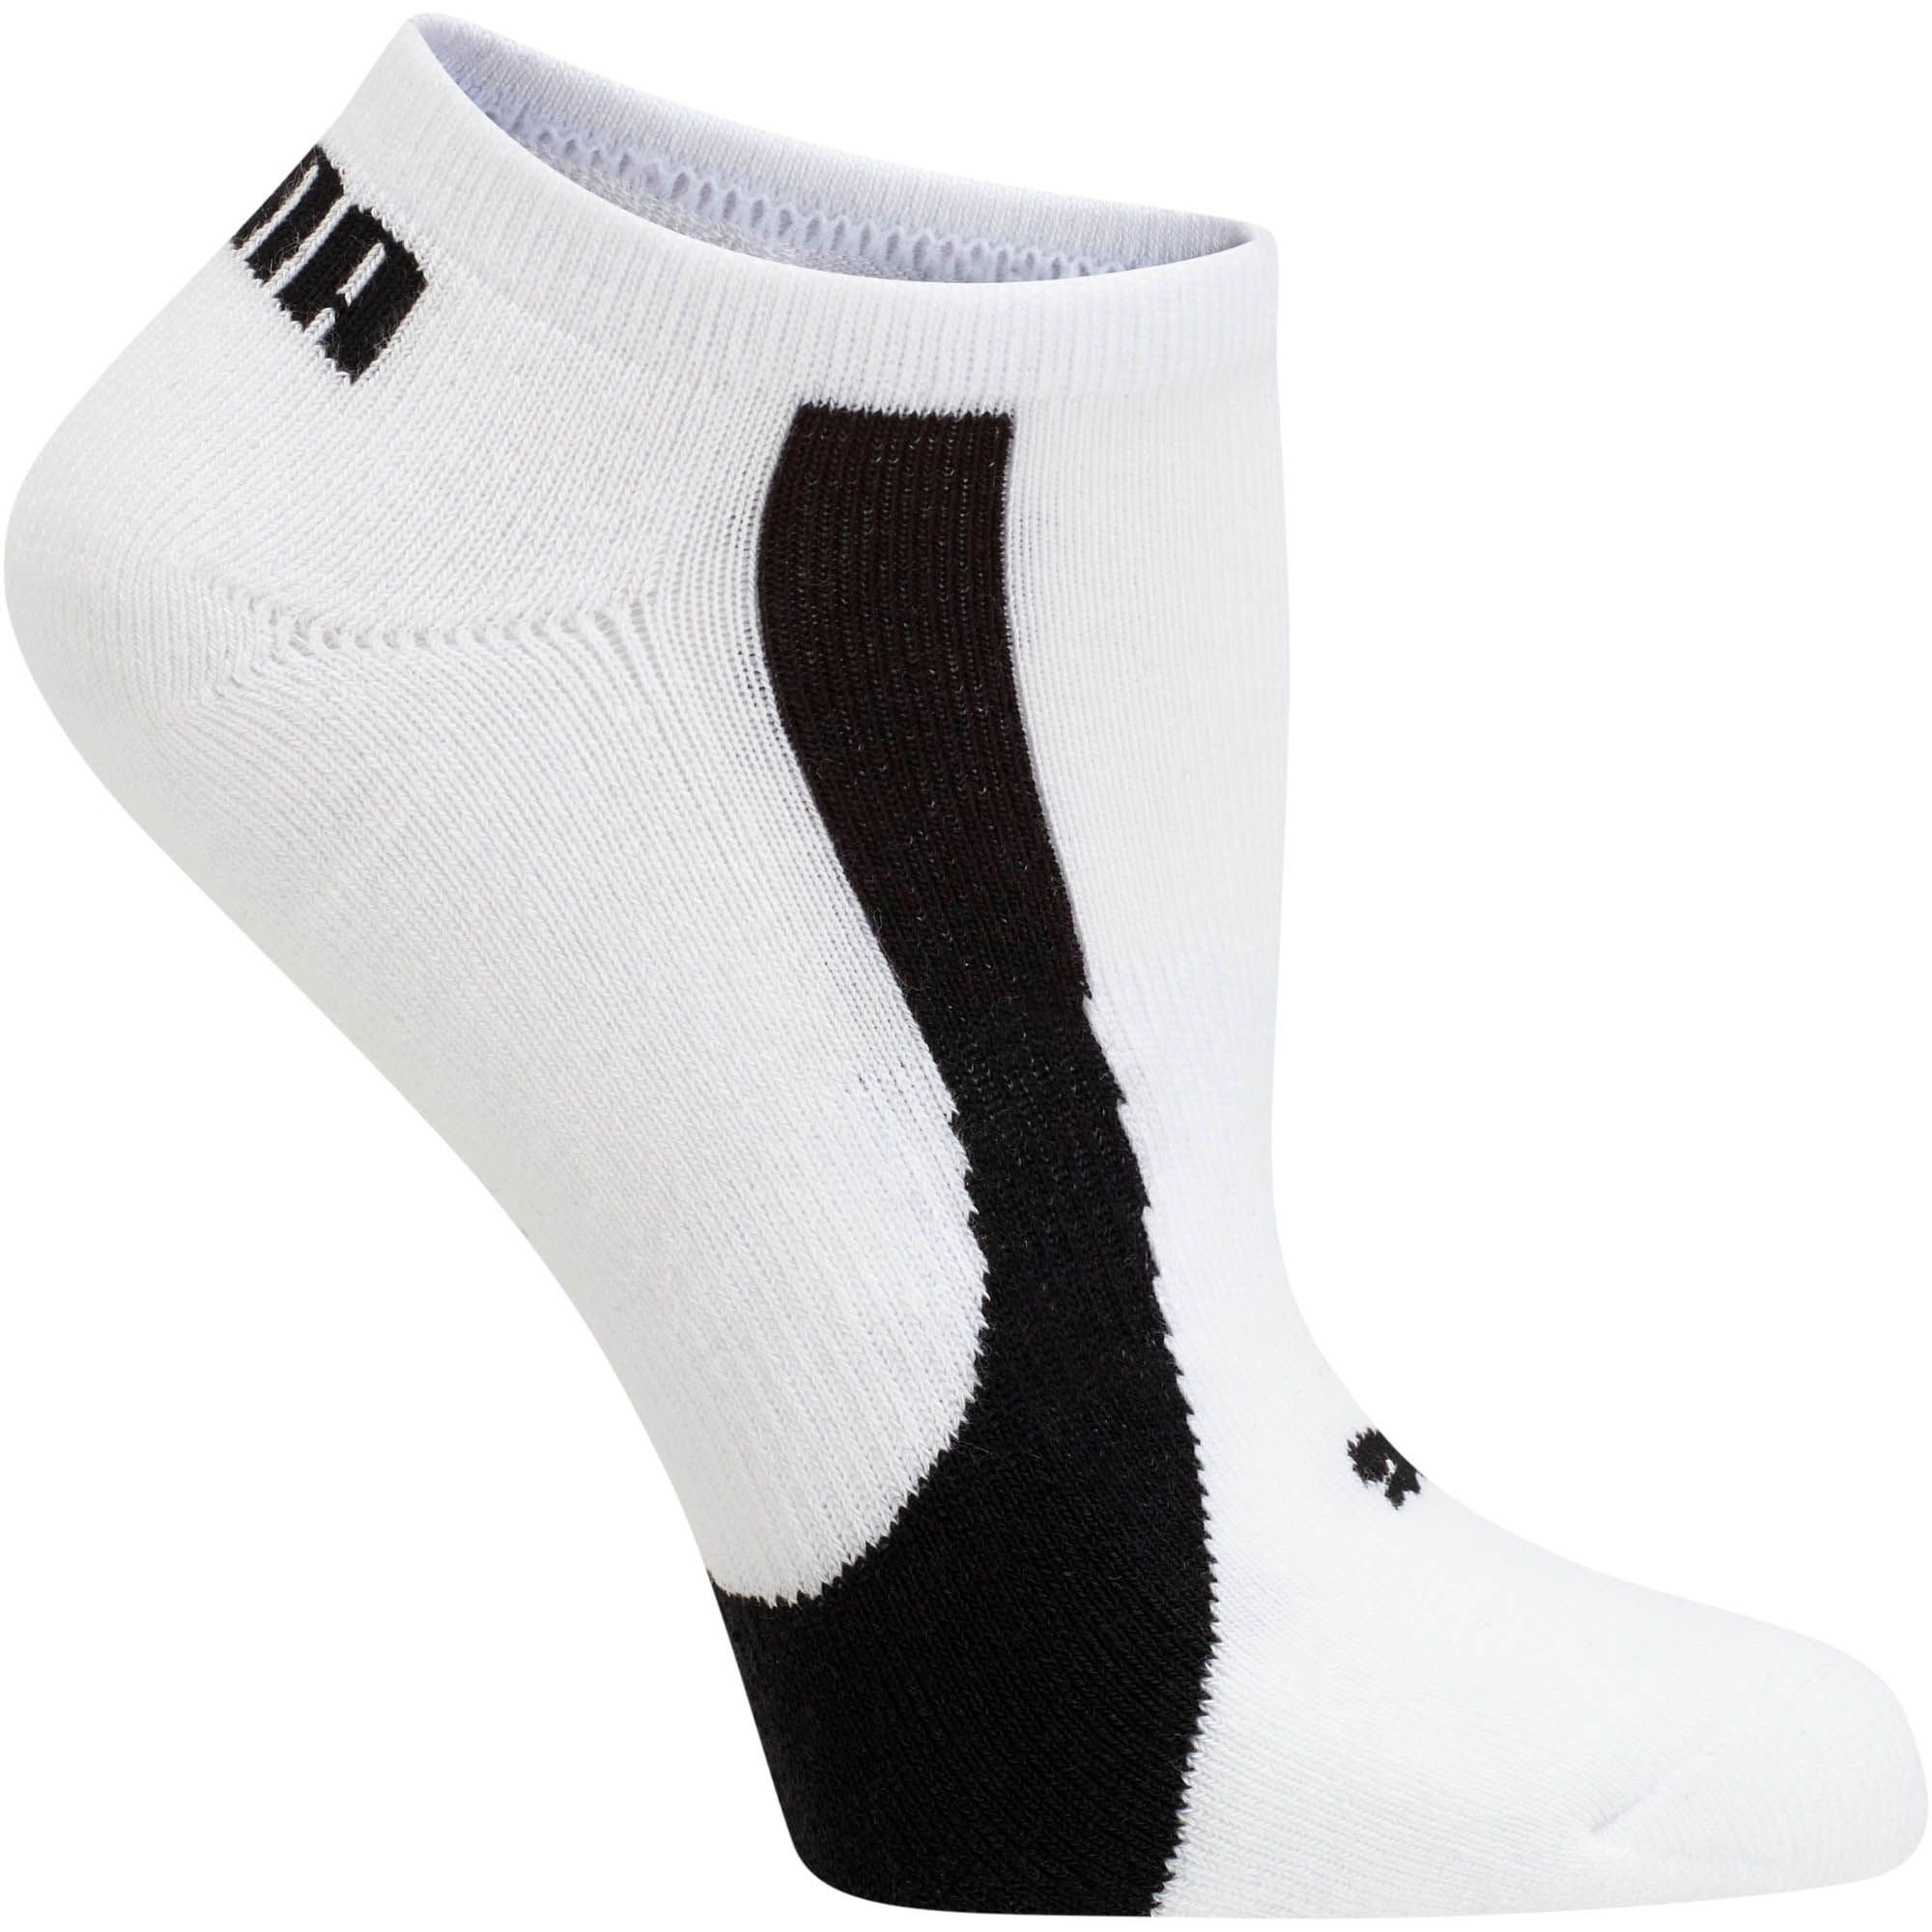 Thumbnail 3 of Women's No Show Socks [3 Pack], white-black, medium